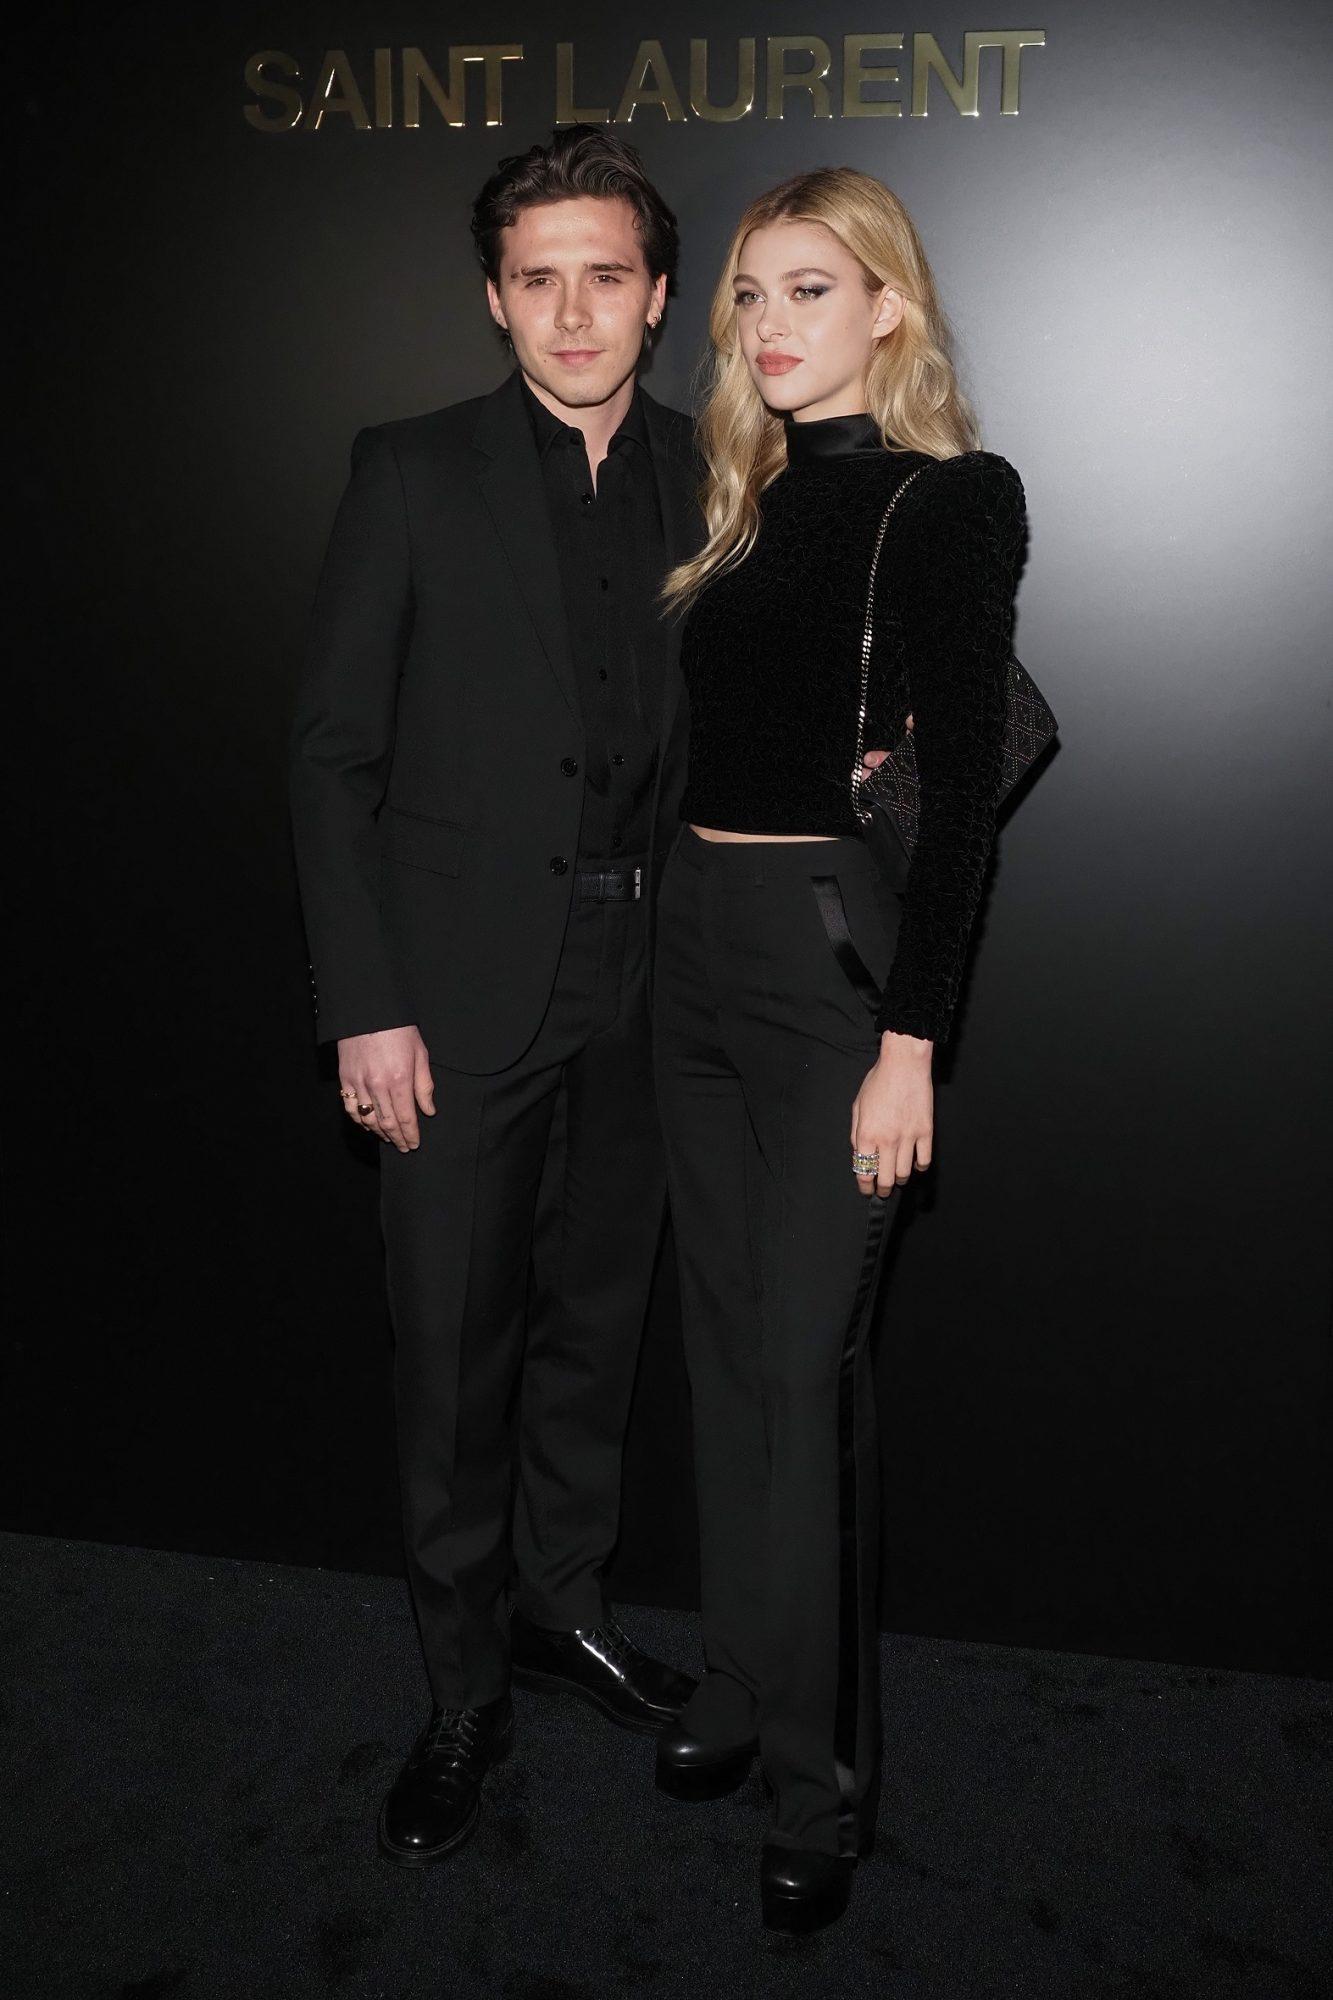 Nicola Peltz: Η σύντροφος του Brooklyn Beckham έχει και τρομερό στυλ